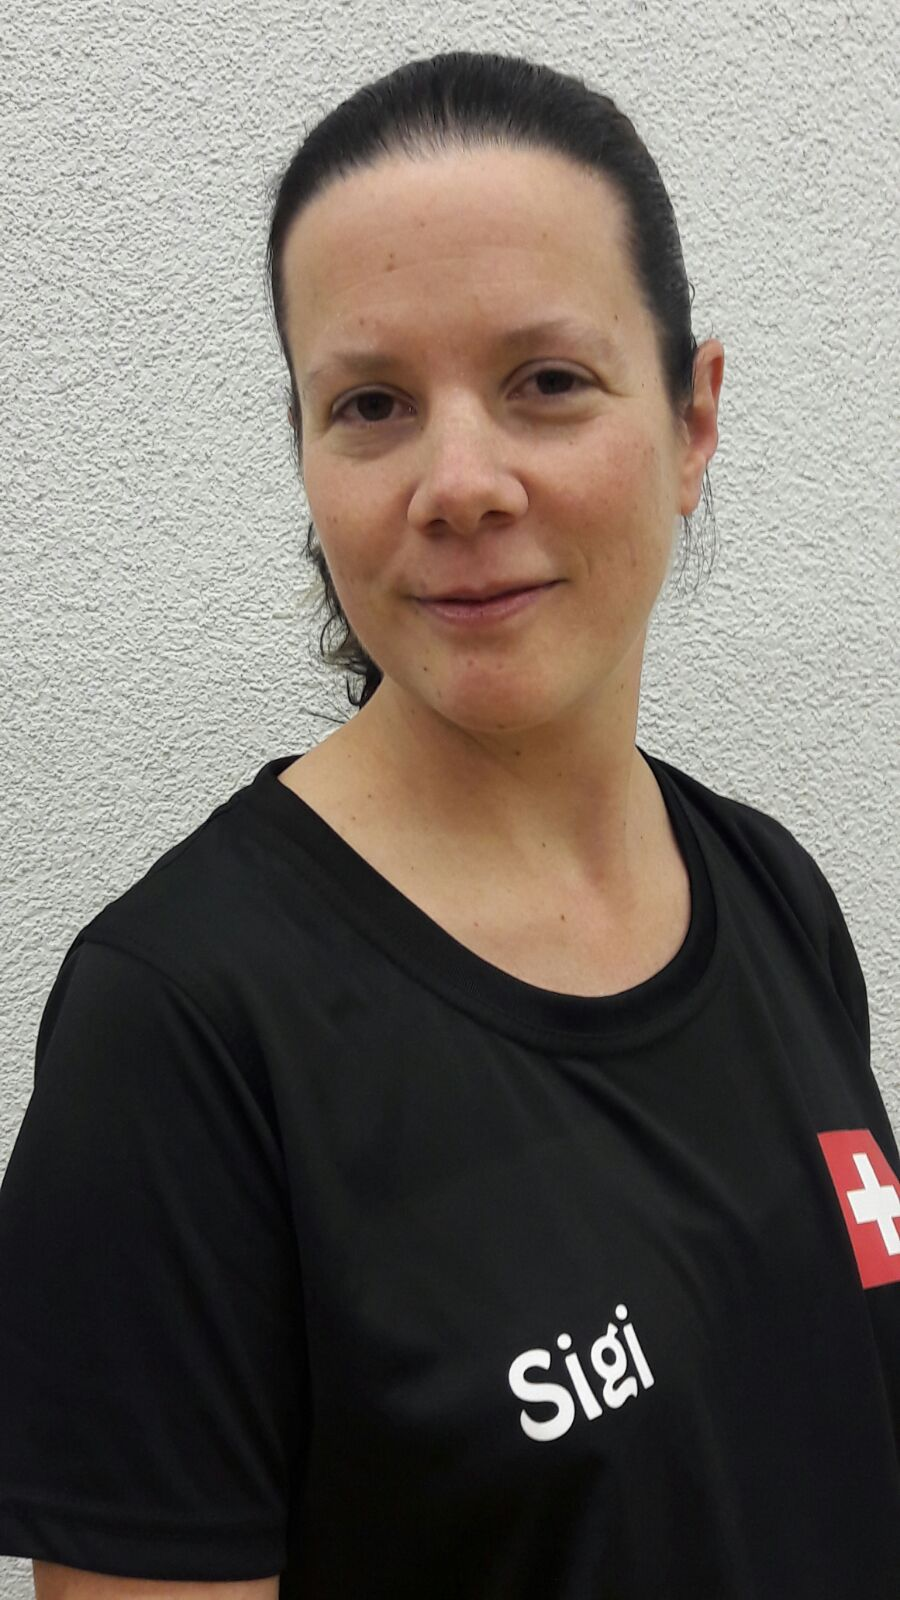 Ramona Siegenthaler, BE